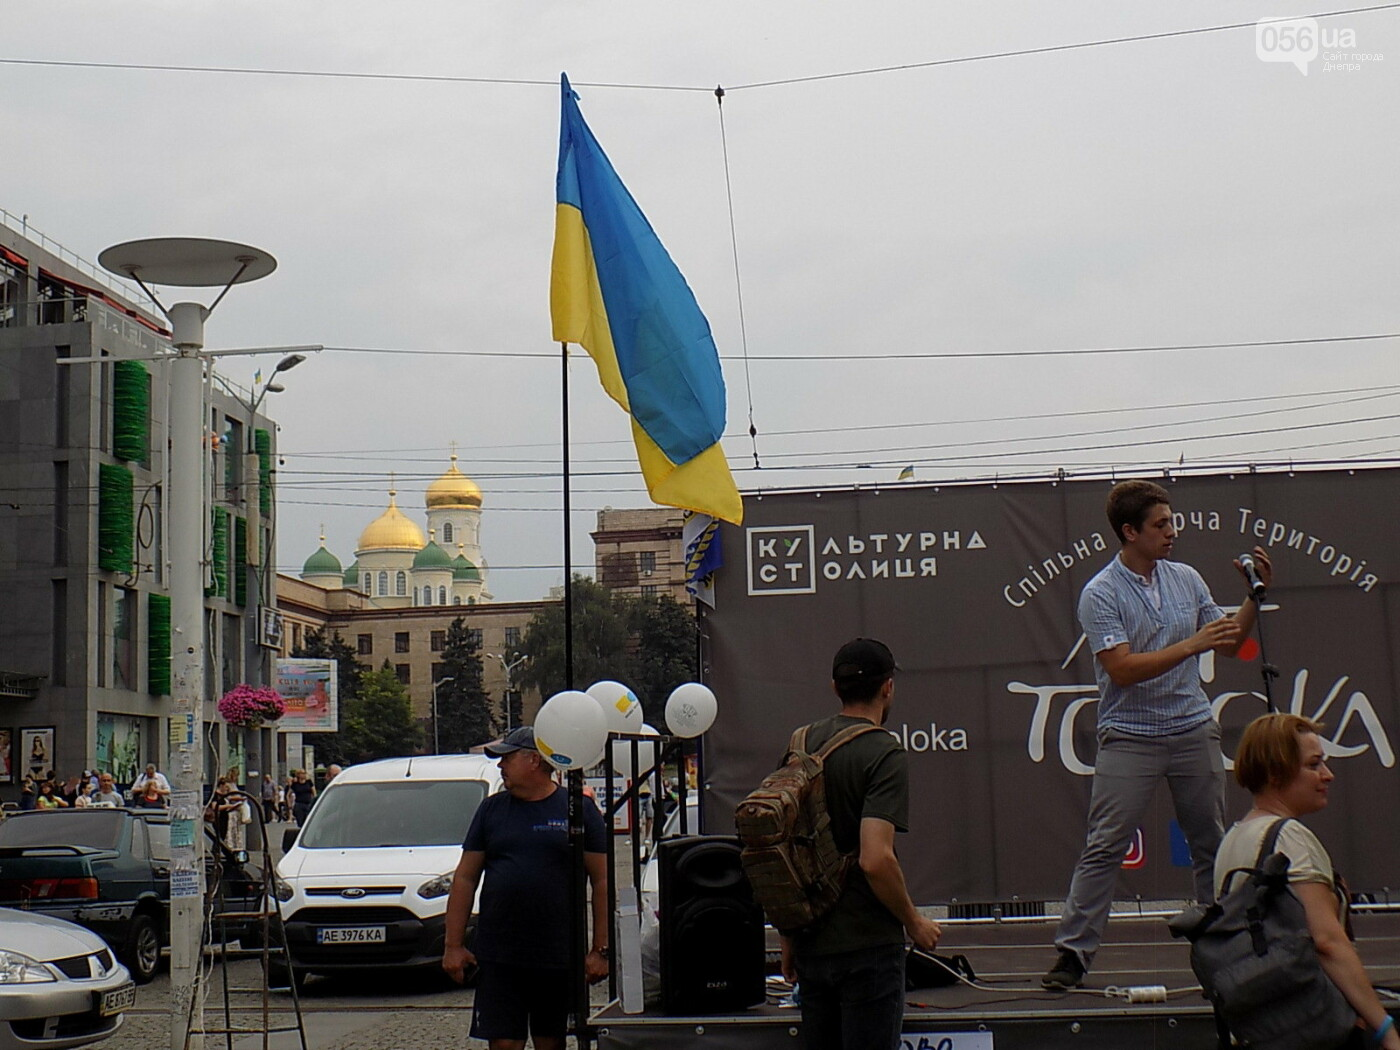 """Мова єднає Дніпро"": в центре города прошла символическая акция с концертом и подарками, - ФОТО, фото-2"